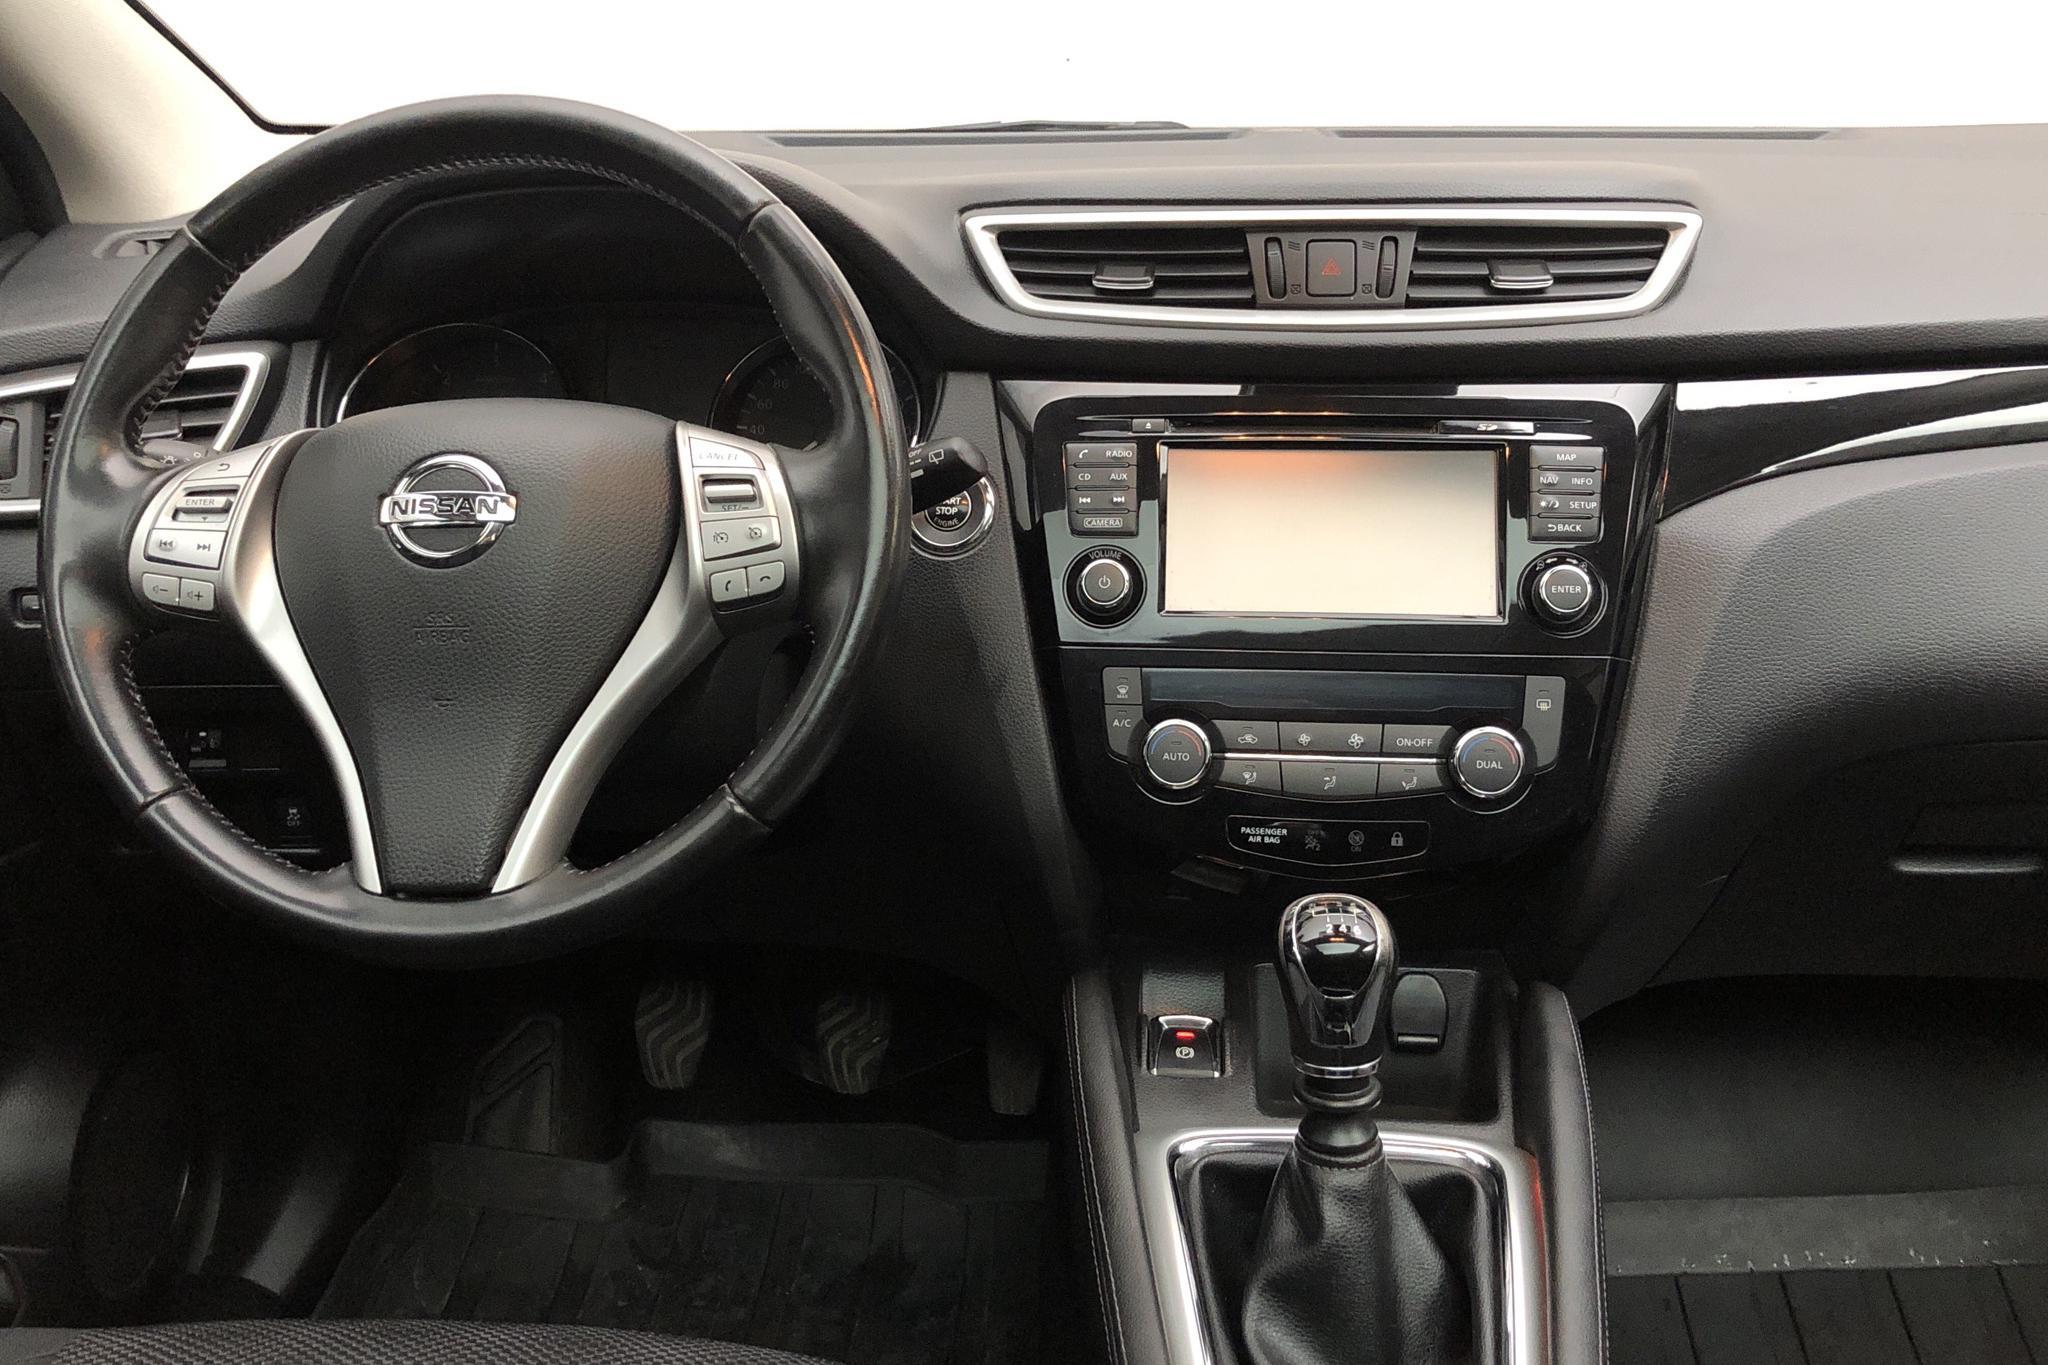 Nissan Qashqai 1.5 dCi (110hk) - 7 531 mil - Manuell - grå - 2016